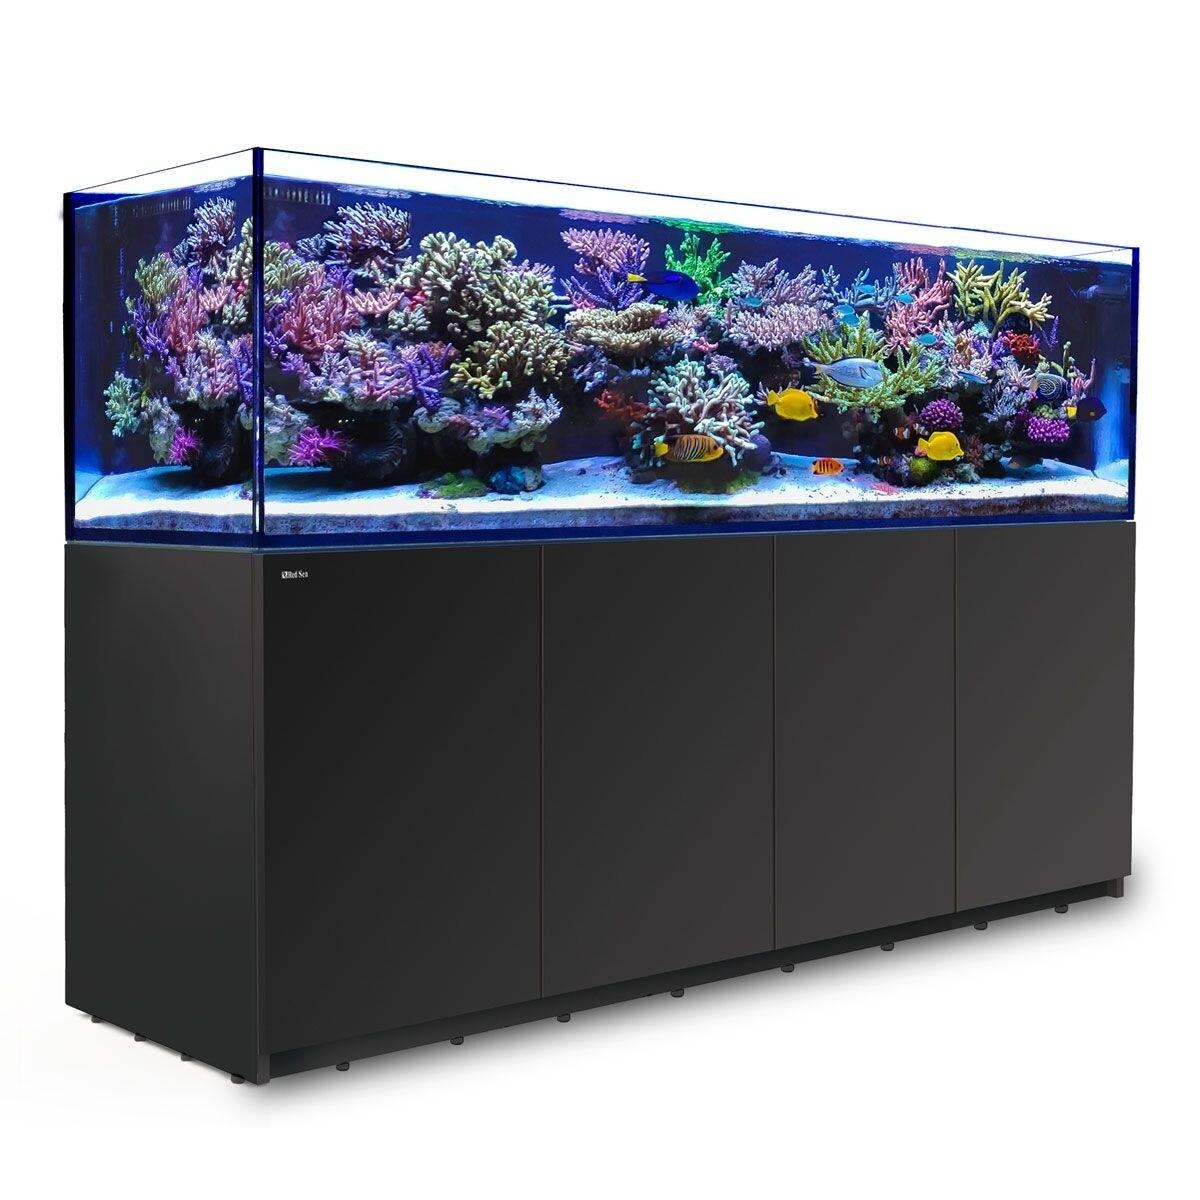 Red Sea Reefer 900 3XL Marine Reef Aquarium Black